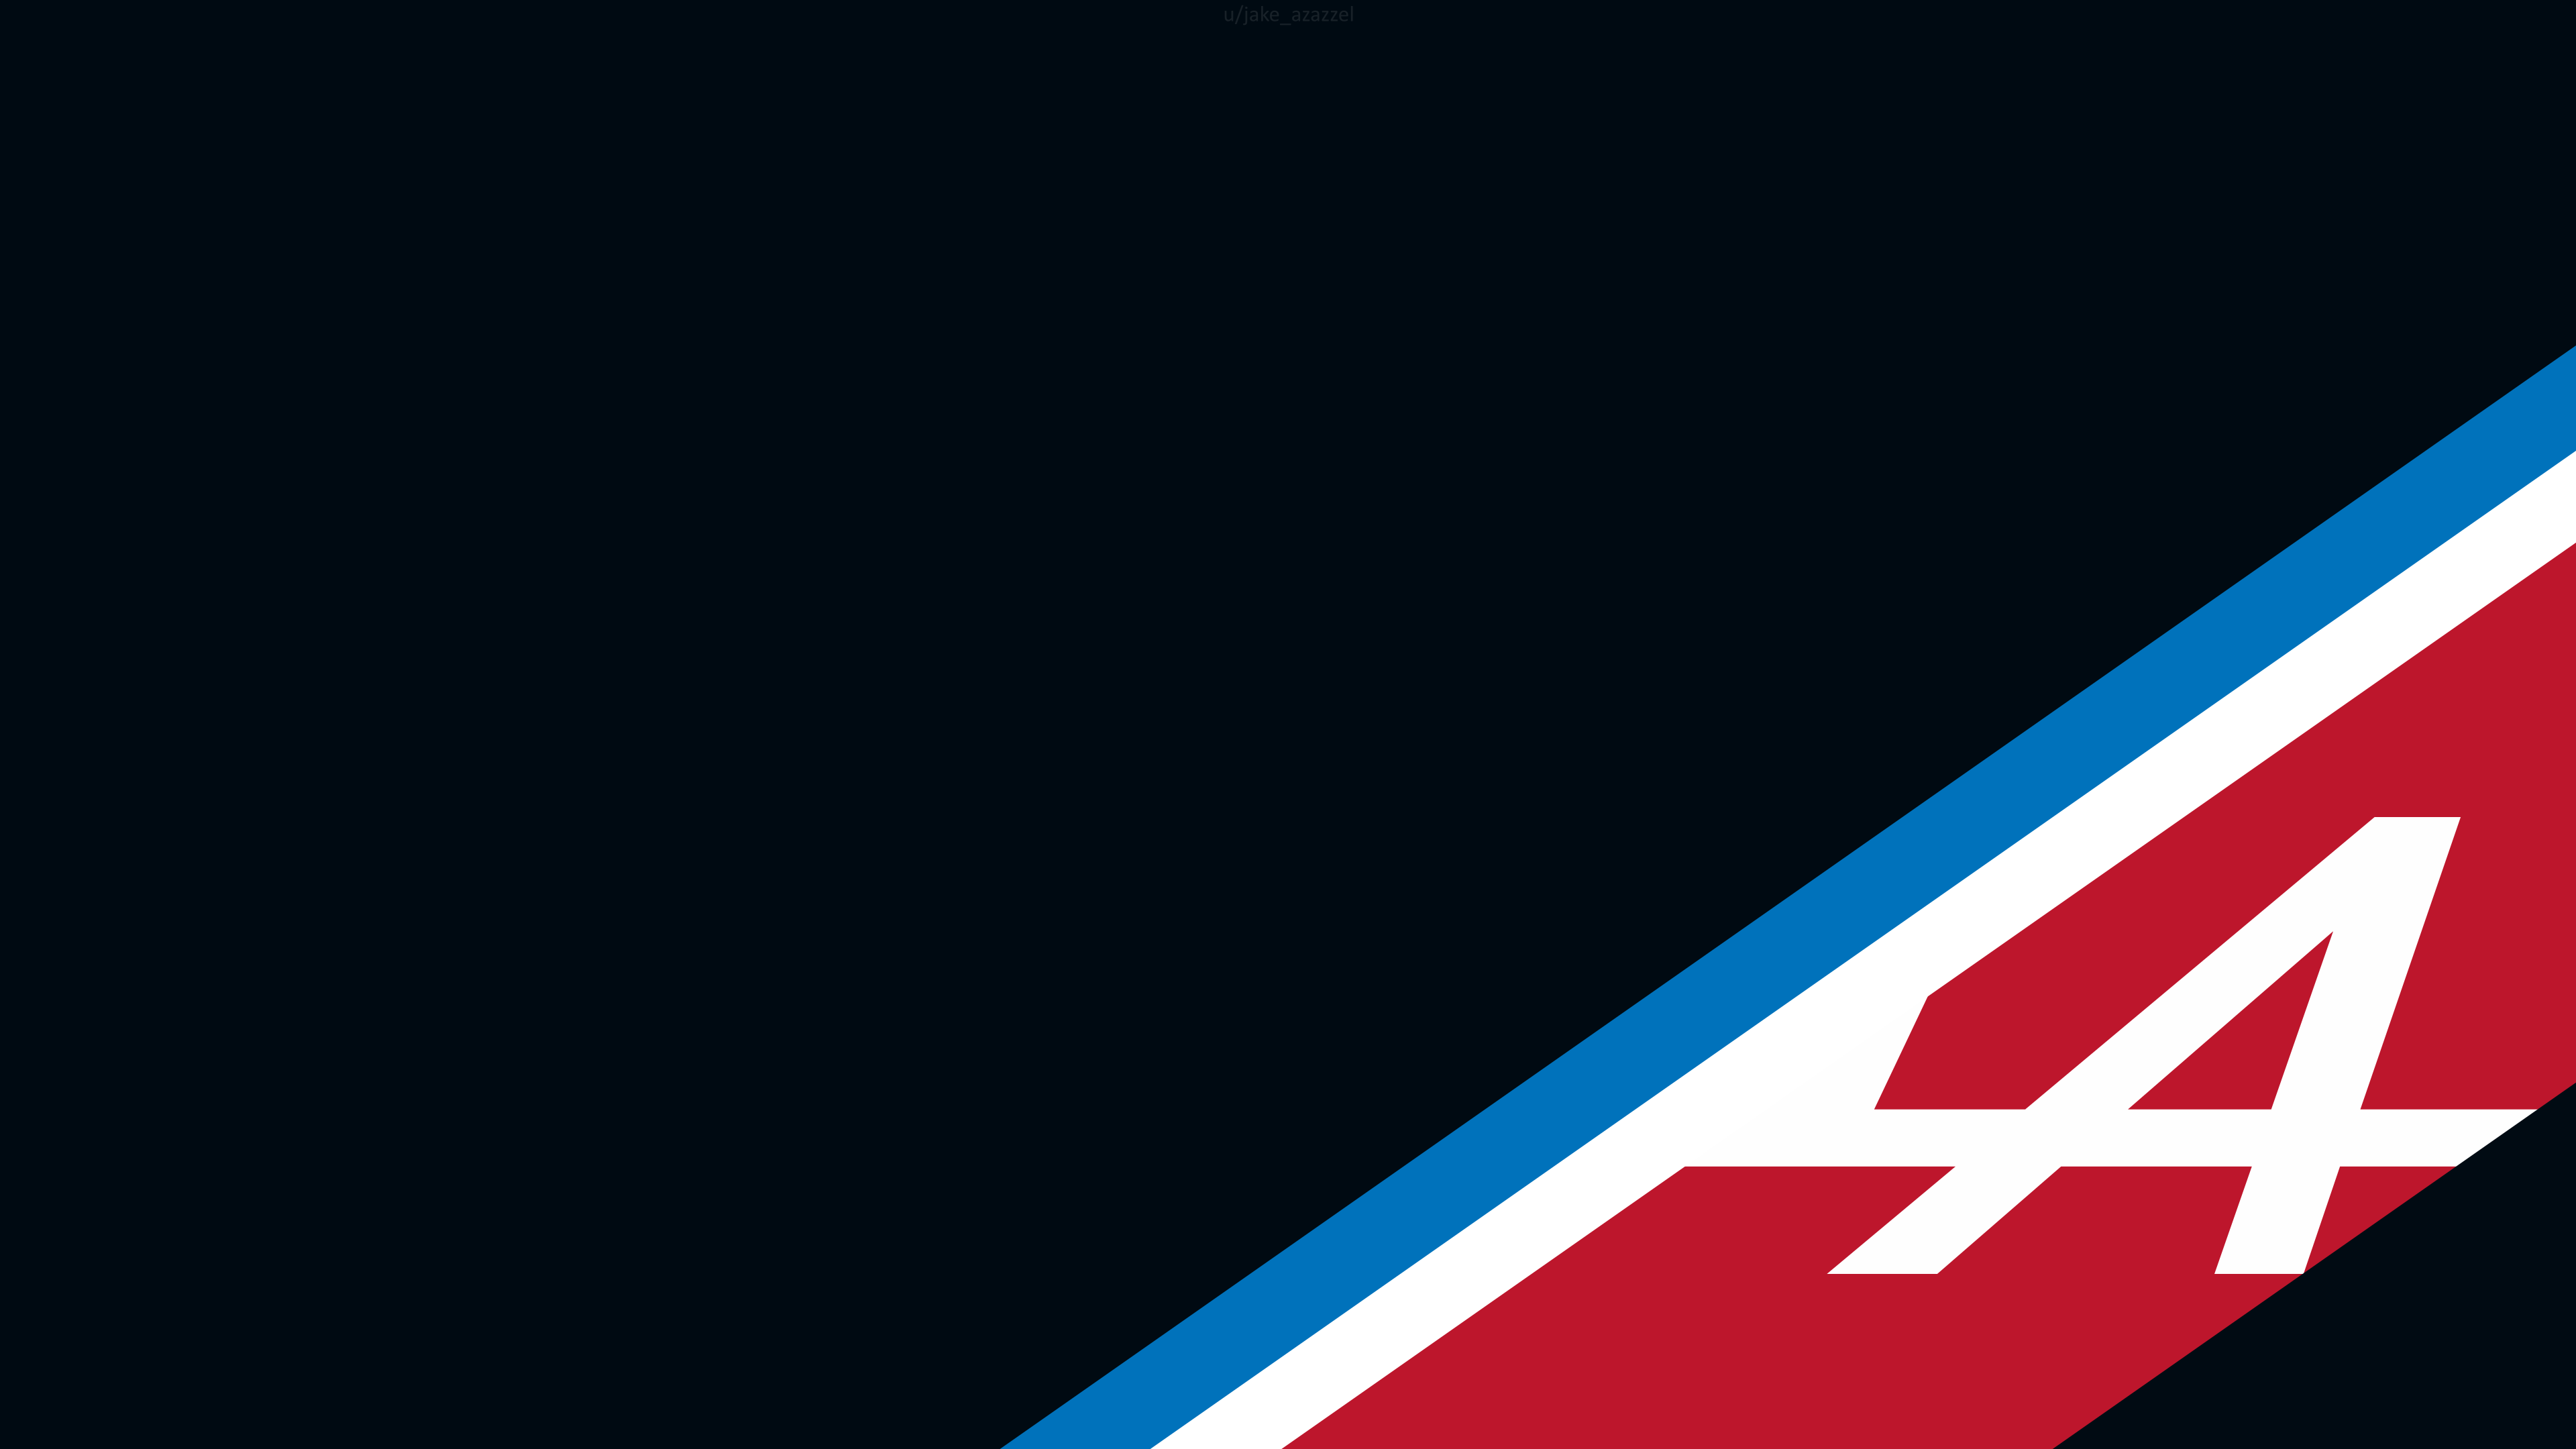 Alpine Zoom Background 6